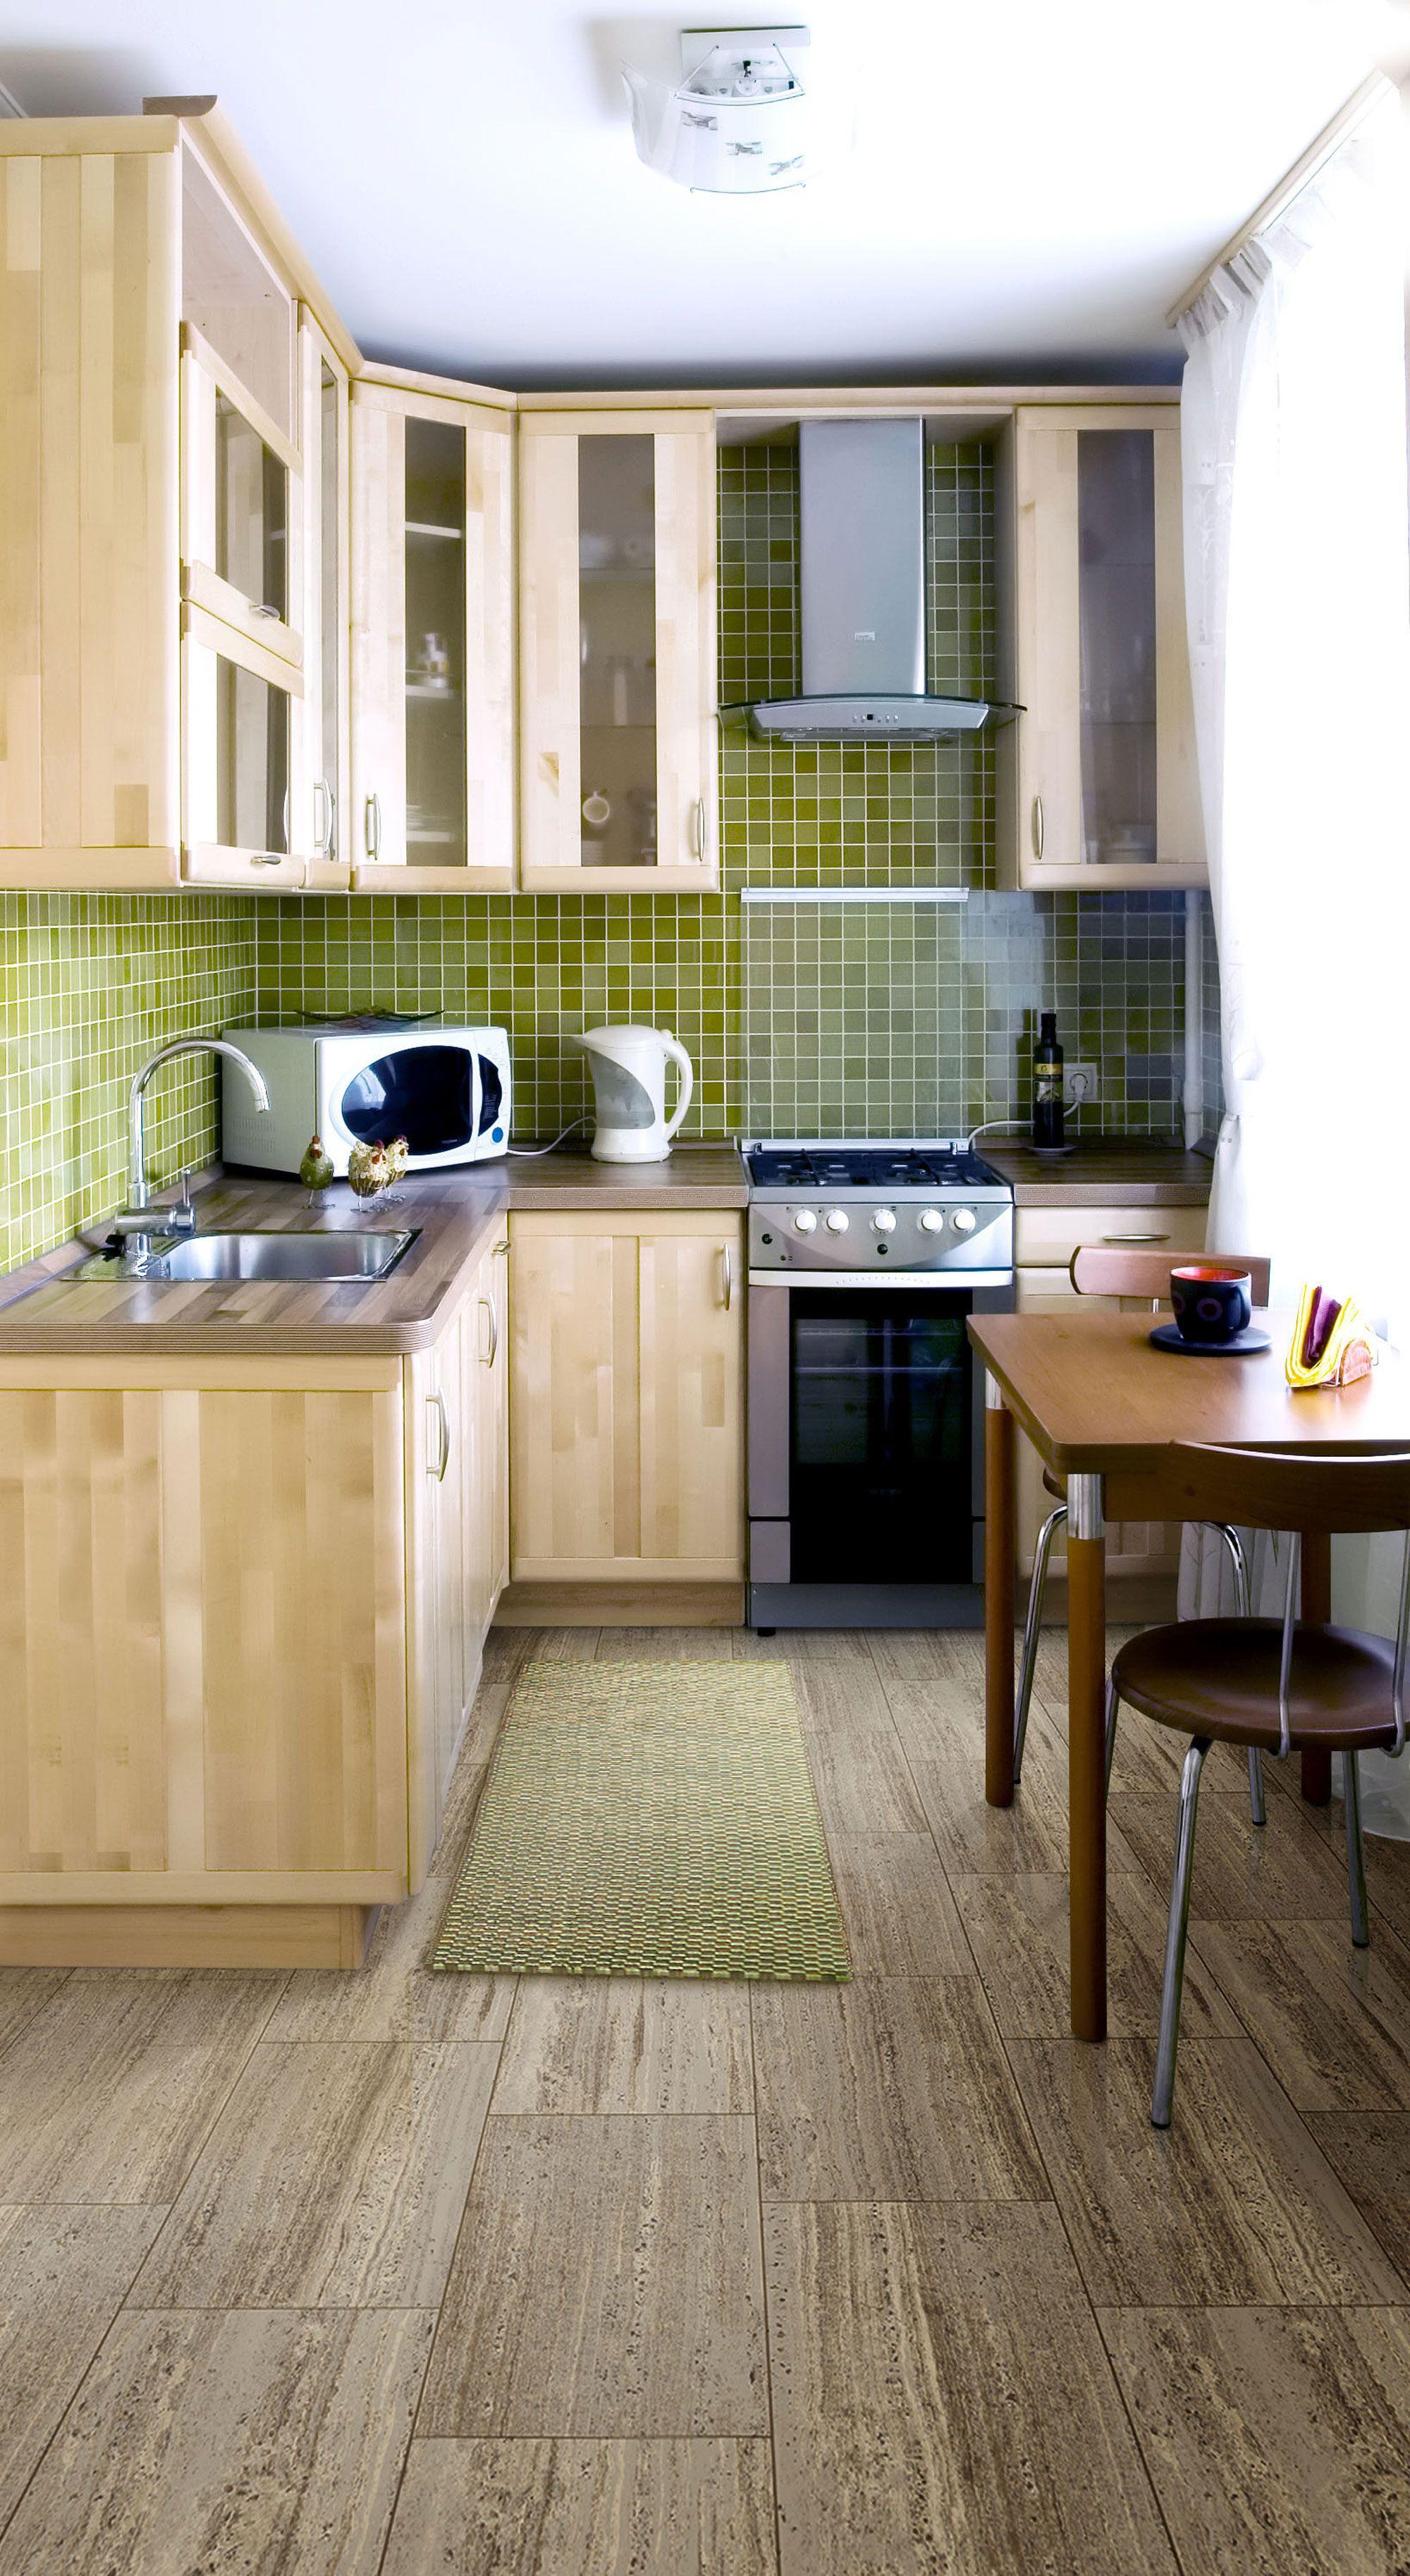 airstep evolution traverstone white sand kitchen remodel small interior design kitchen on kitchen interior small space id=24526